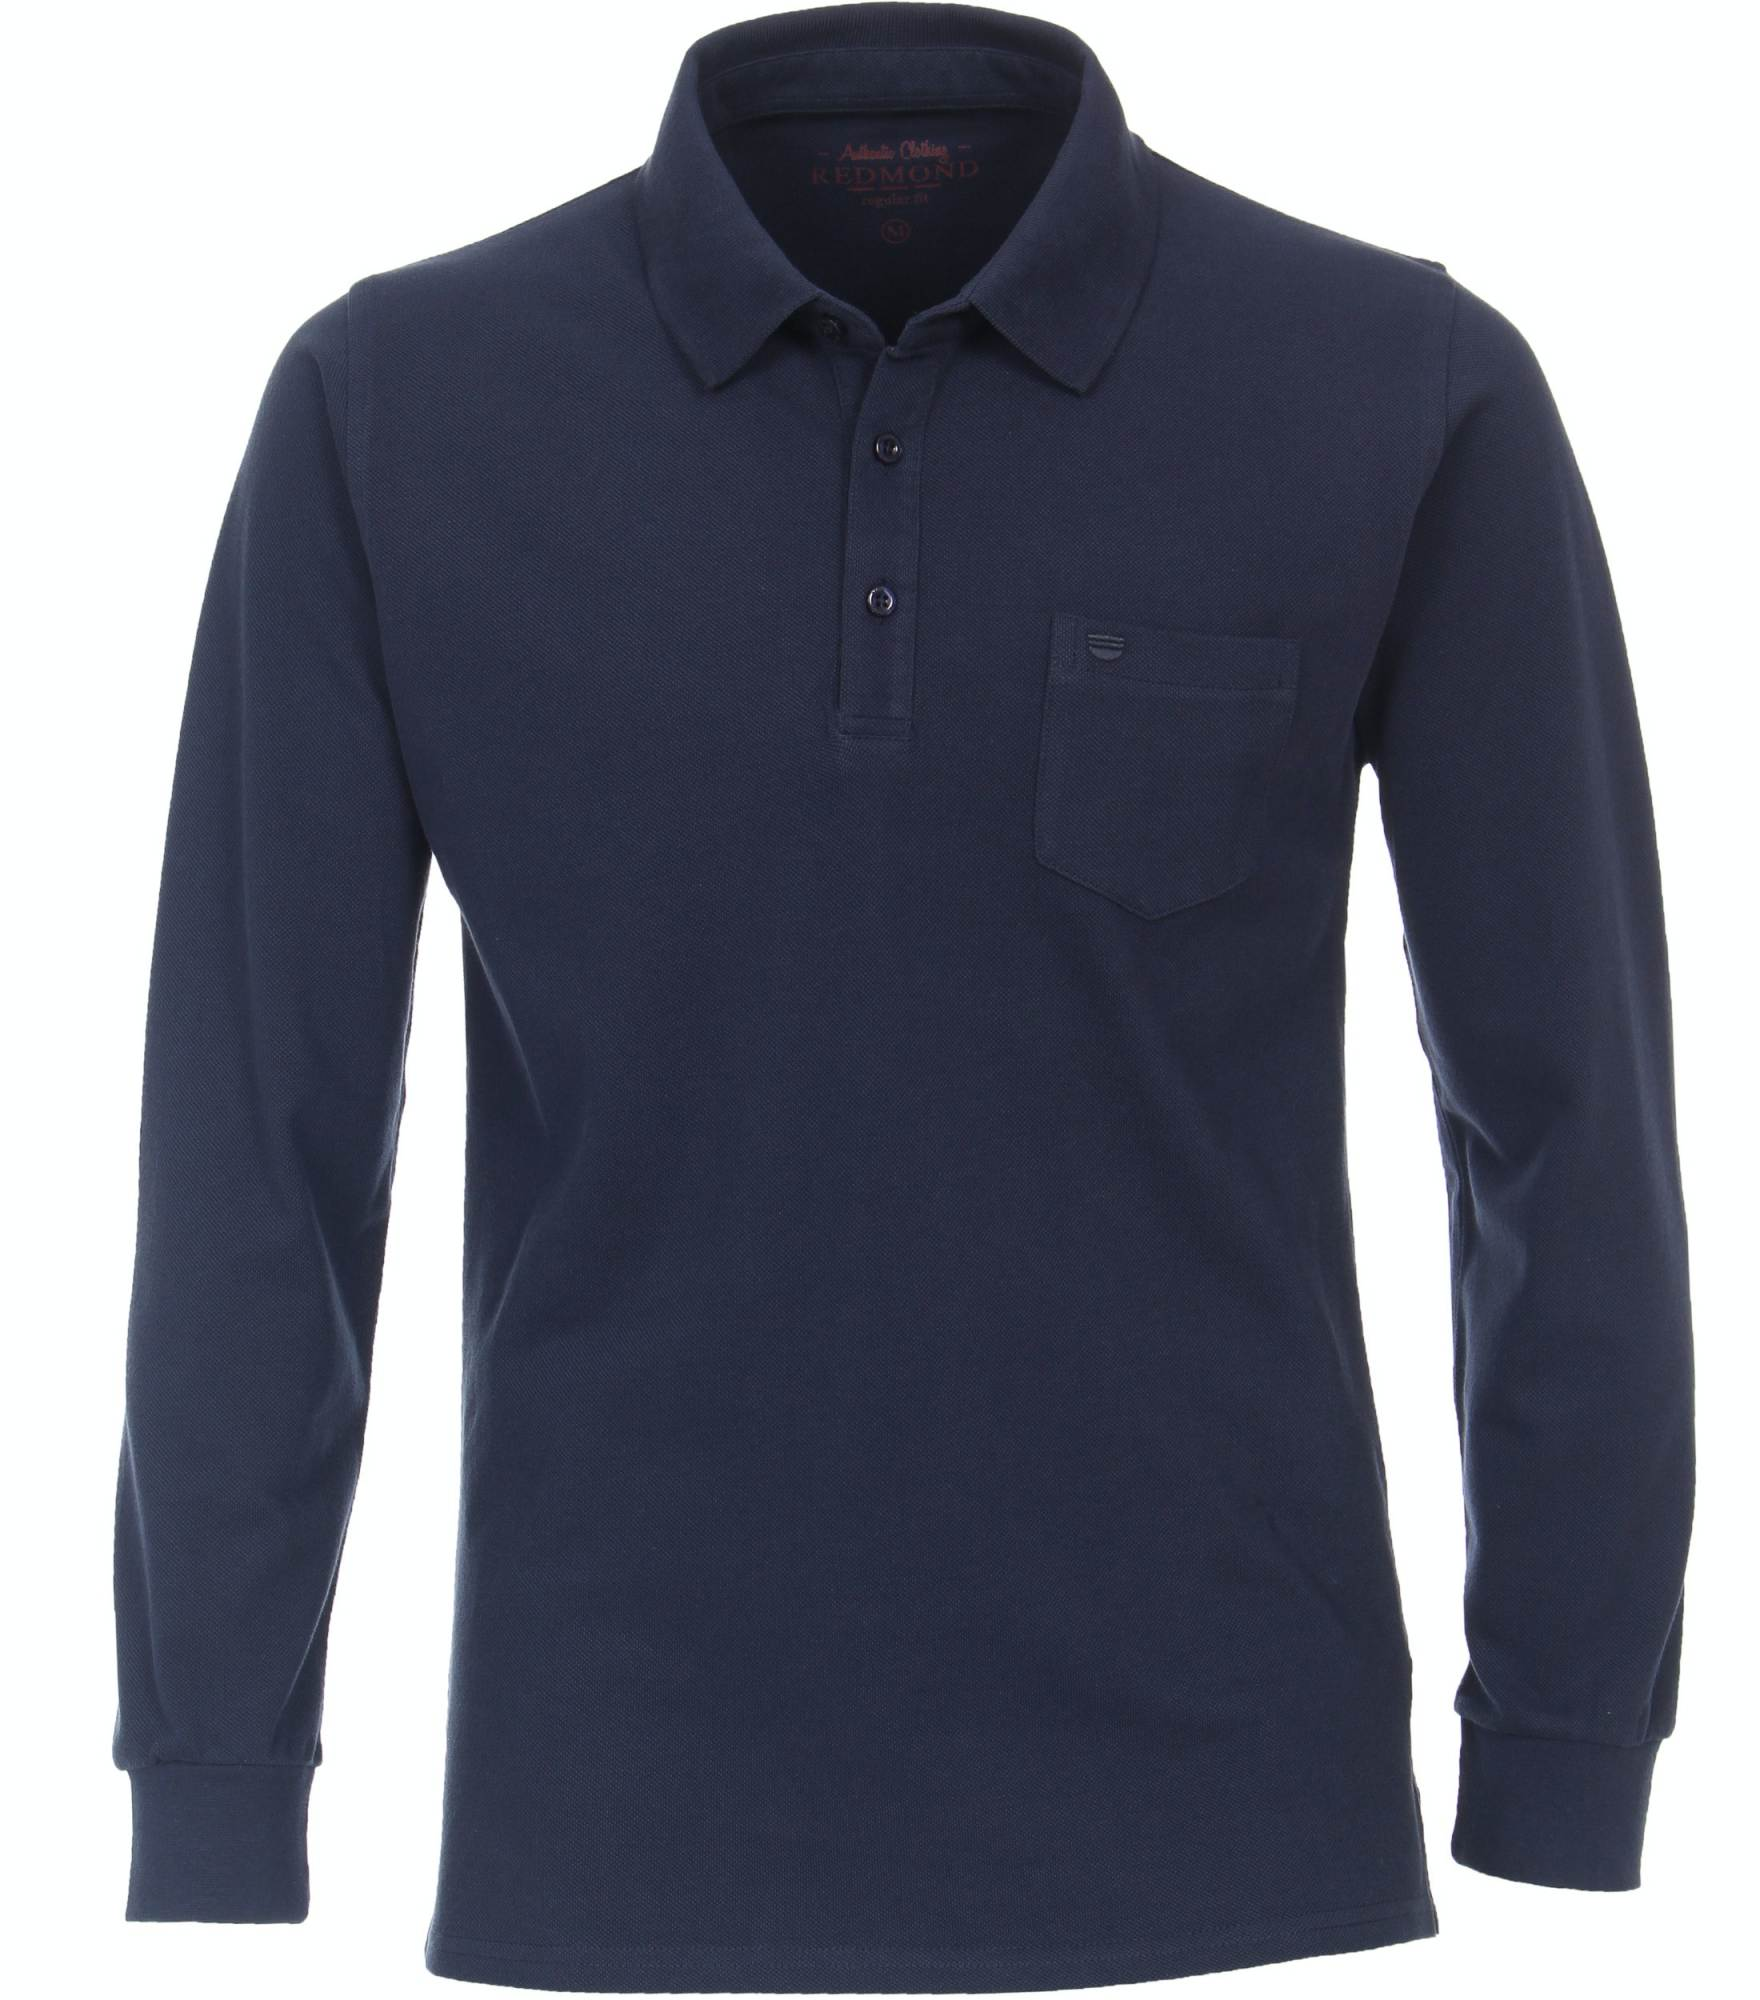 212895950 10 Navy Front - - Con Murphys Menswear